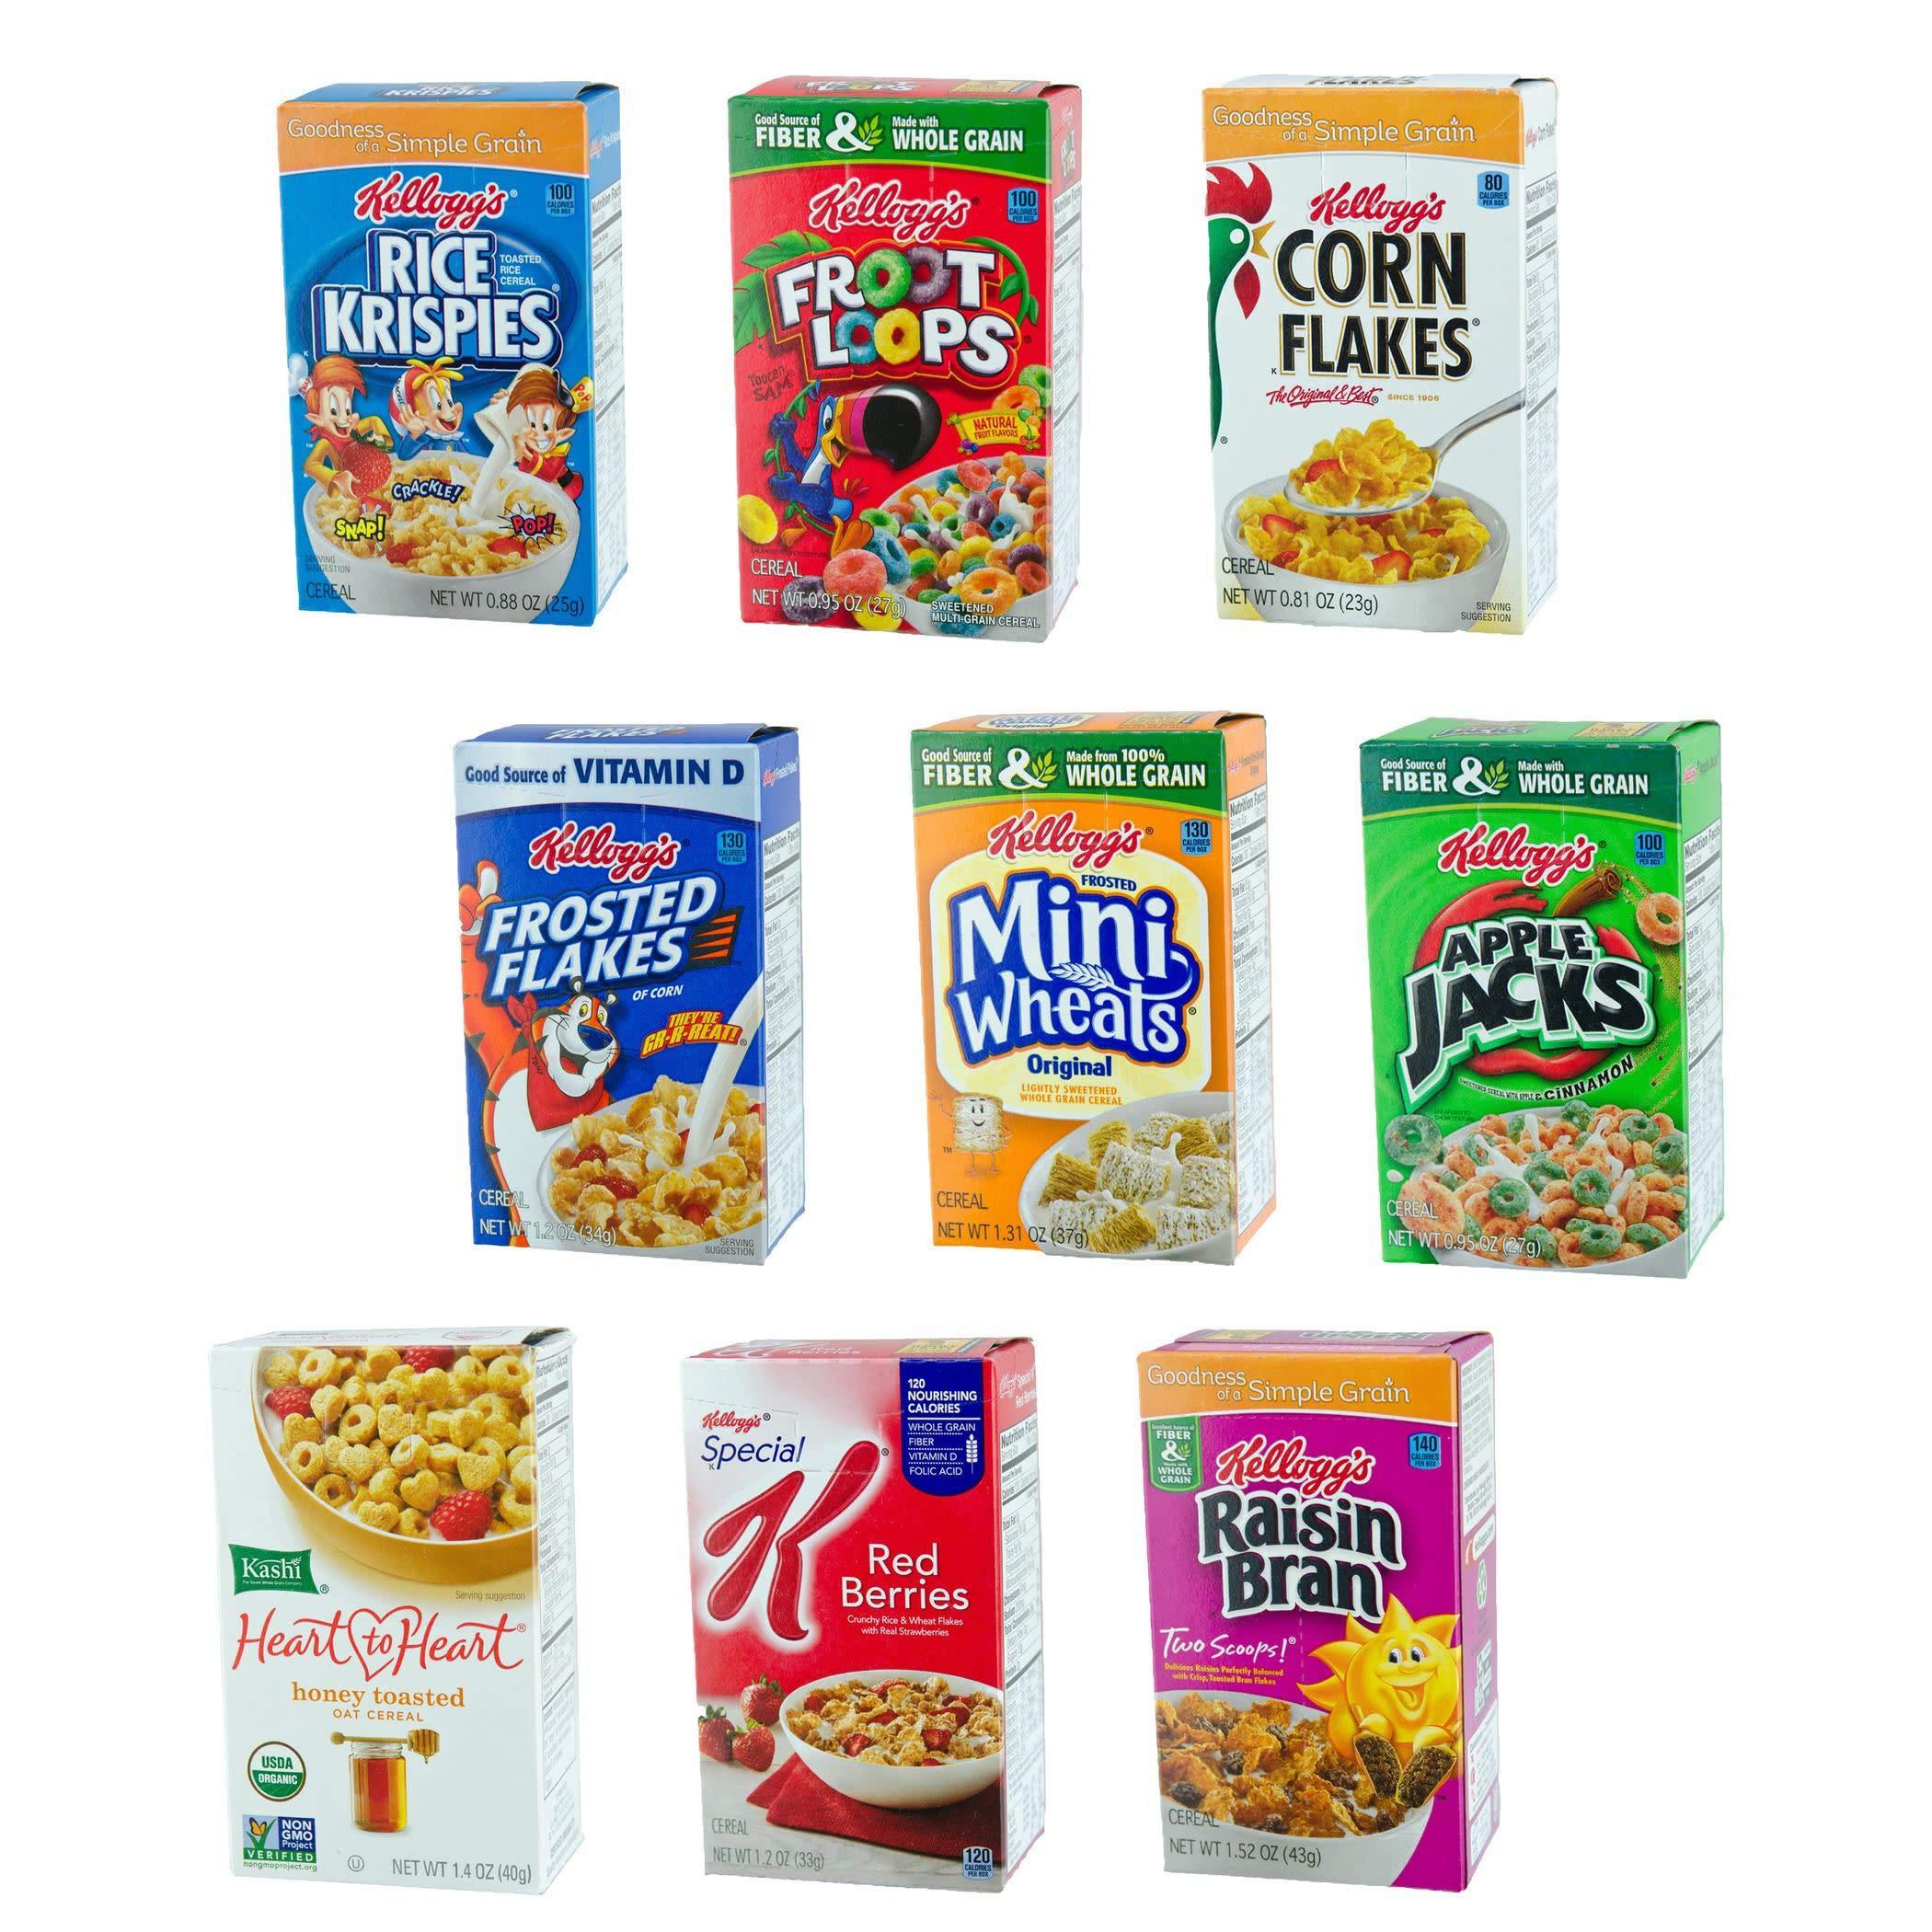 Amazon.com: Kellogg's Breakfast Cereal, Low Fat Granola